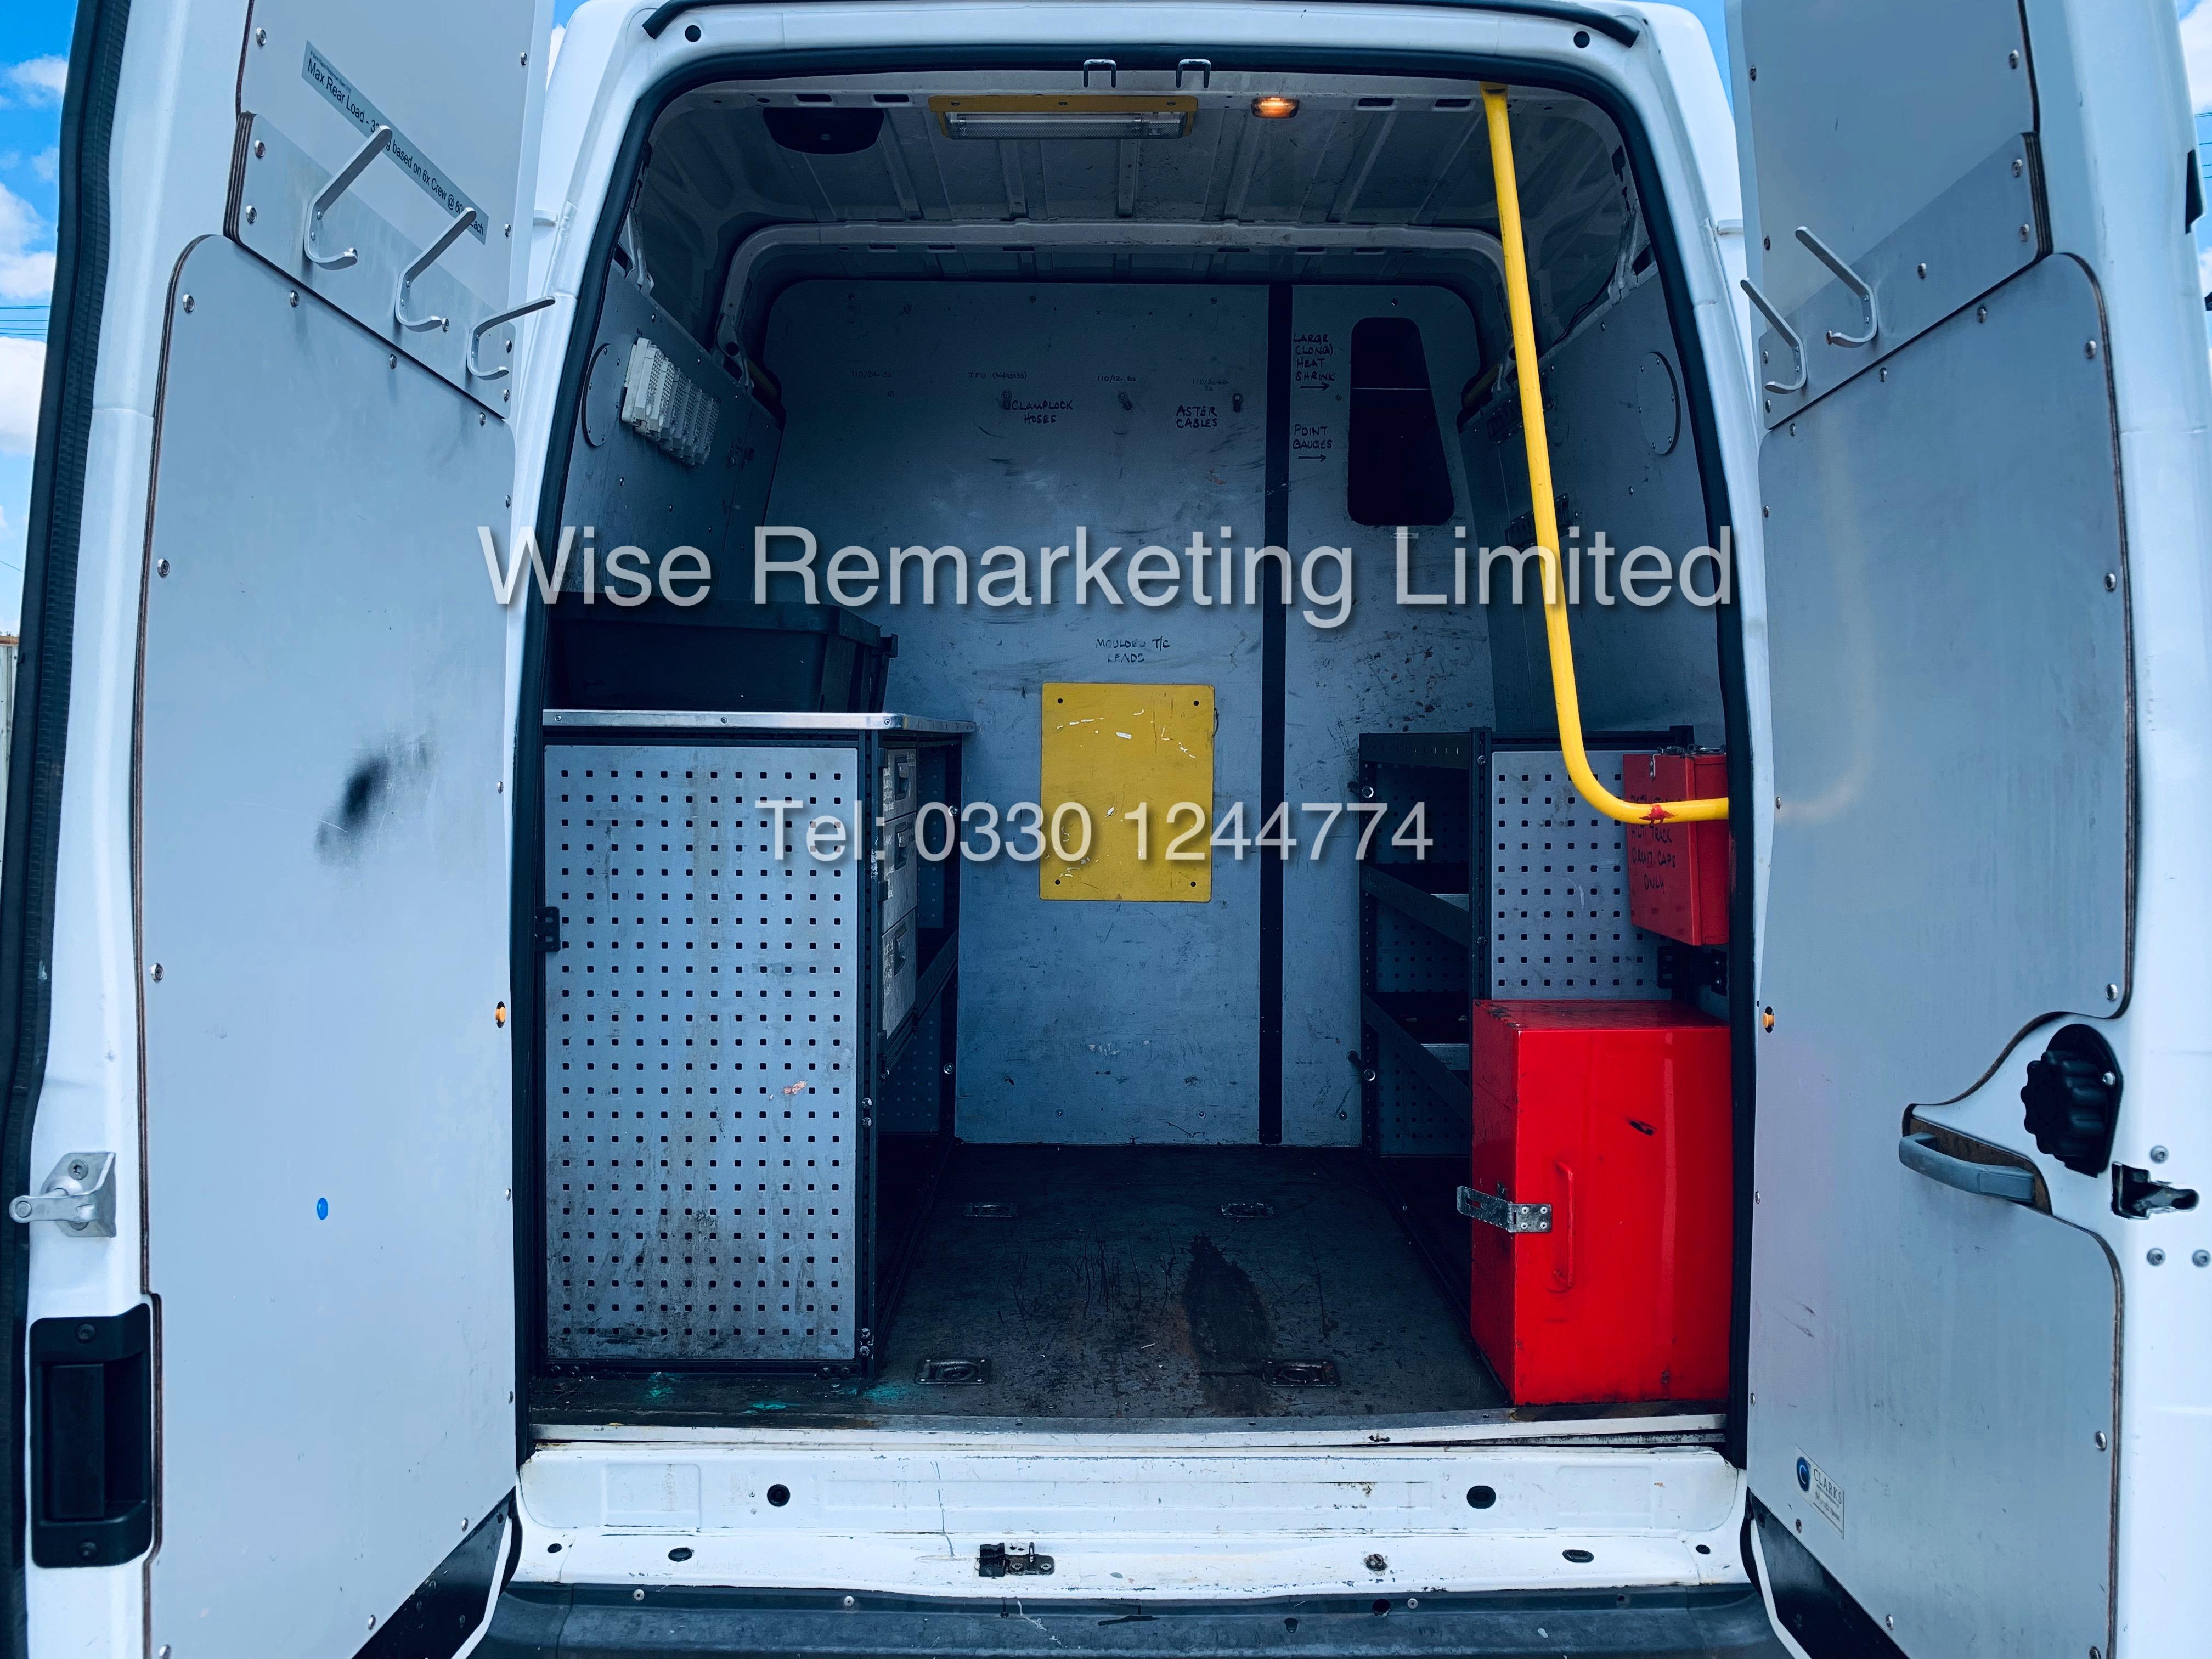 Lot 17 - FORD TRANSIT 350 LWB 2.4 TDCi MESSING/WELFARE VAN (2011) **FSH** 1 COMPANY OWNER